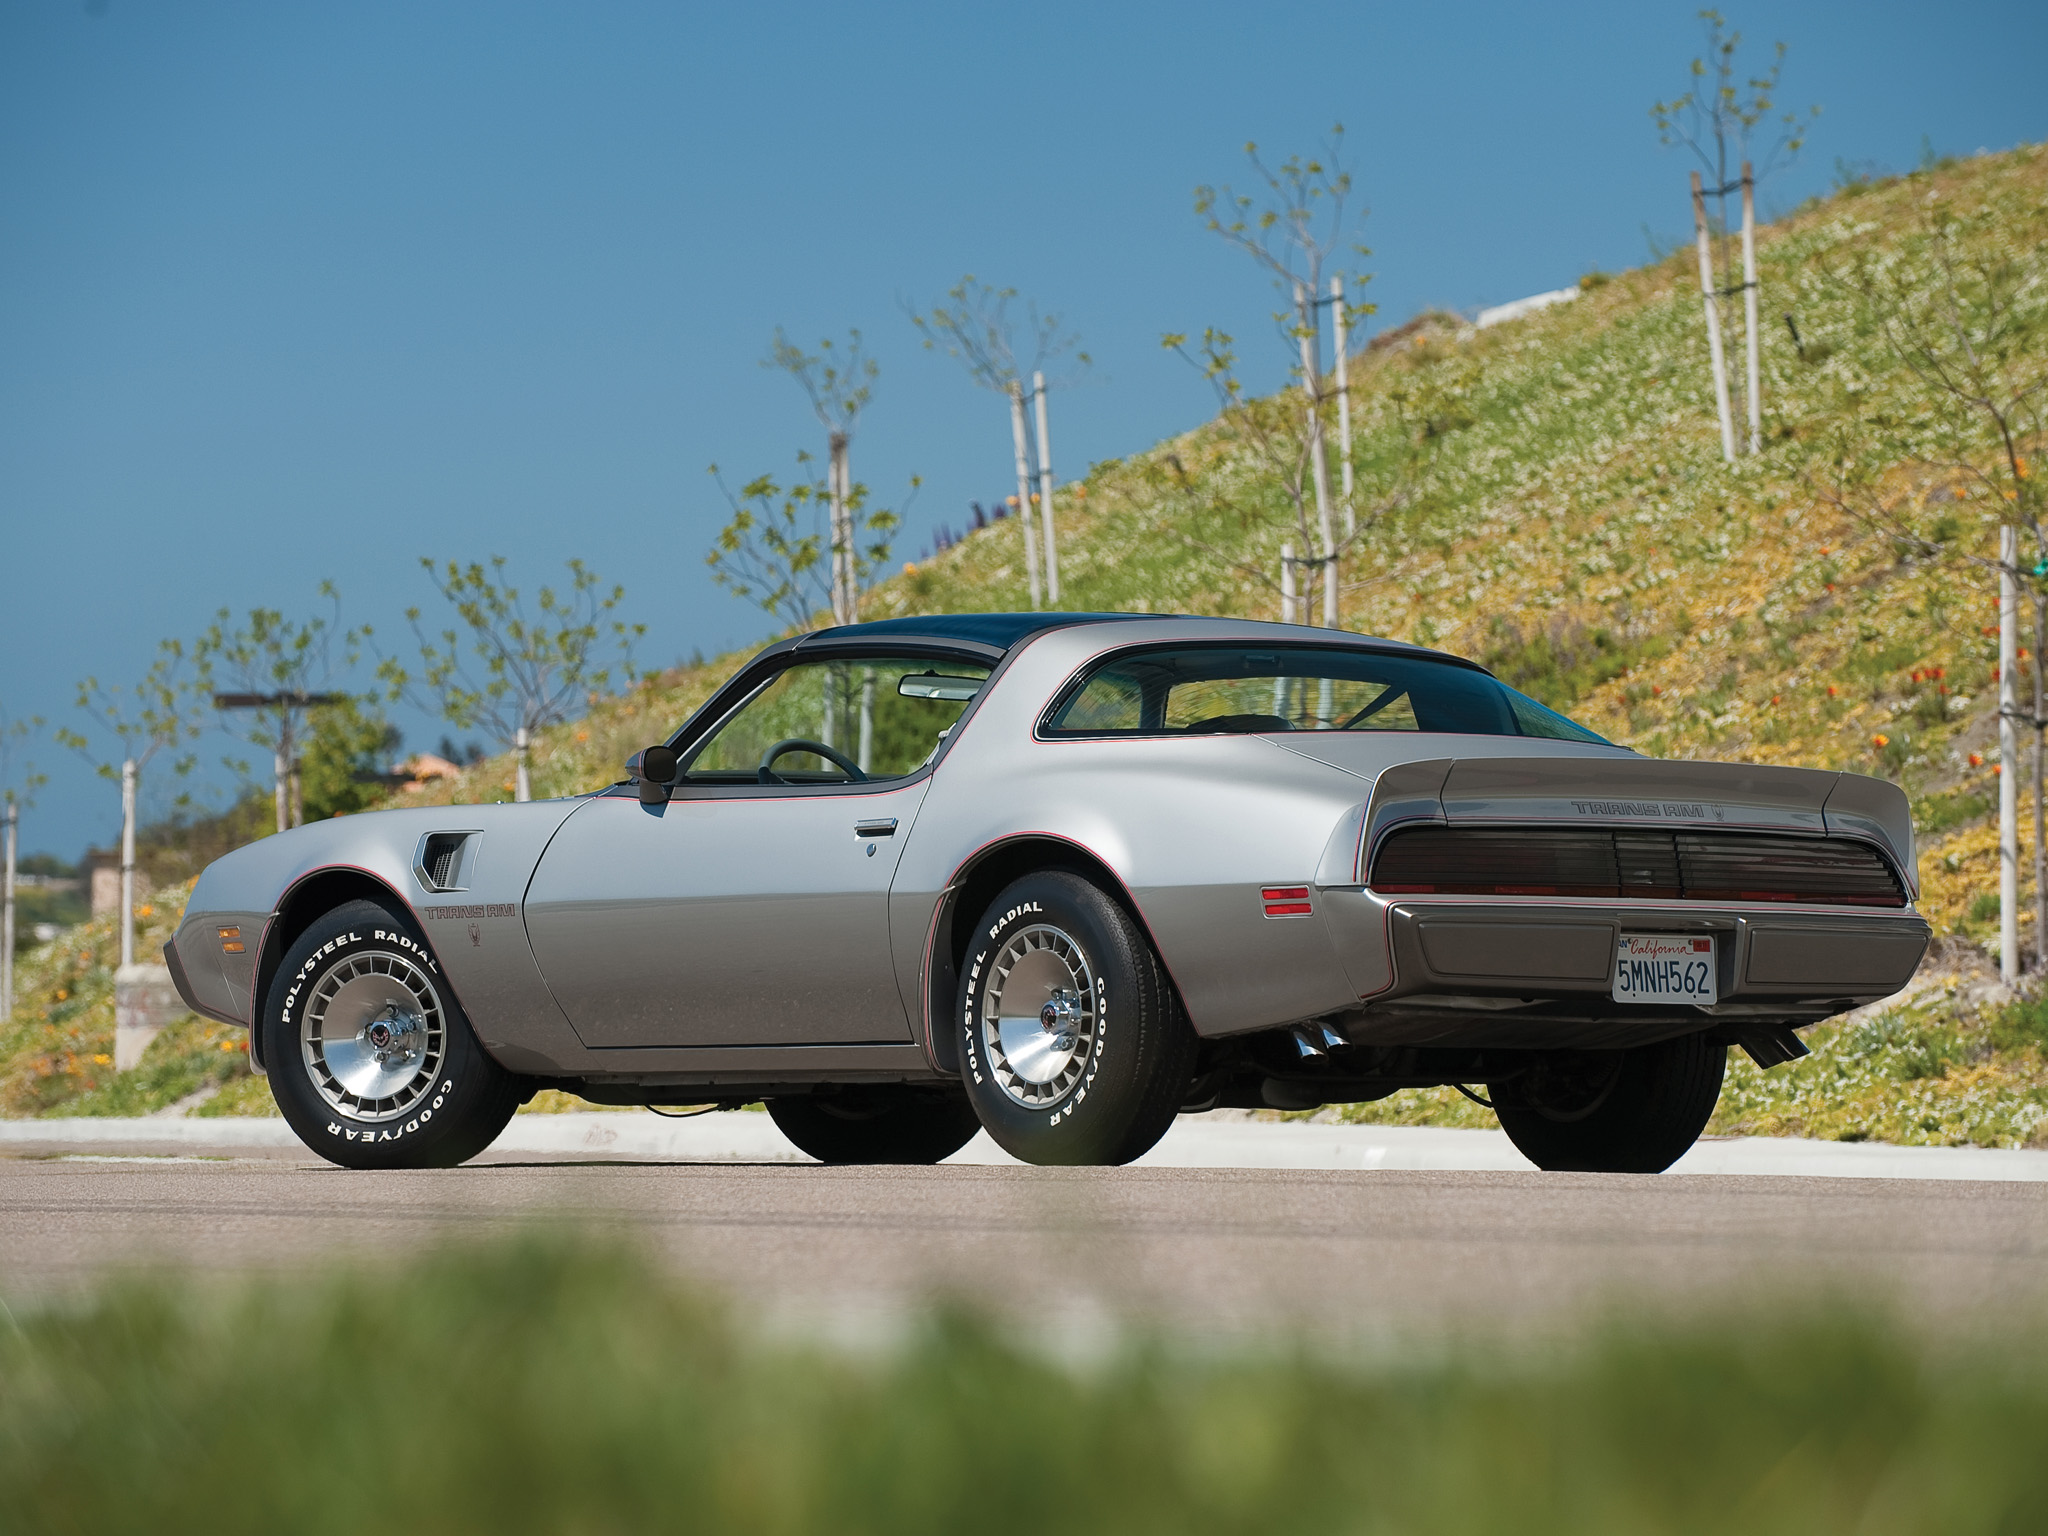 1979 Pontiac Firebird Trans Am T A 6 6 L78 muscle classic q wallpaper 2048x1536